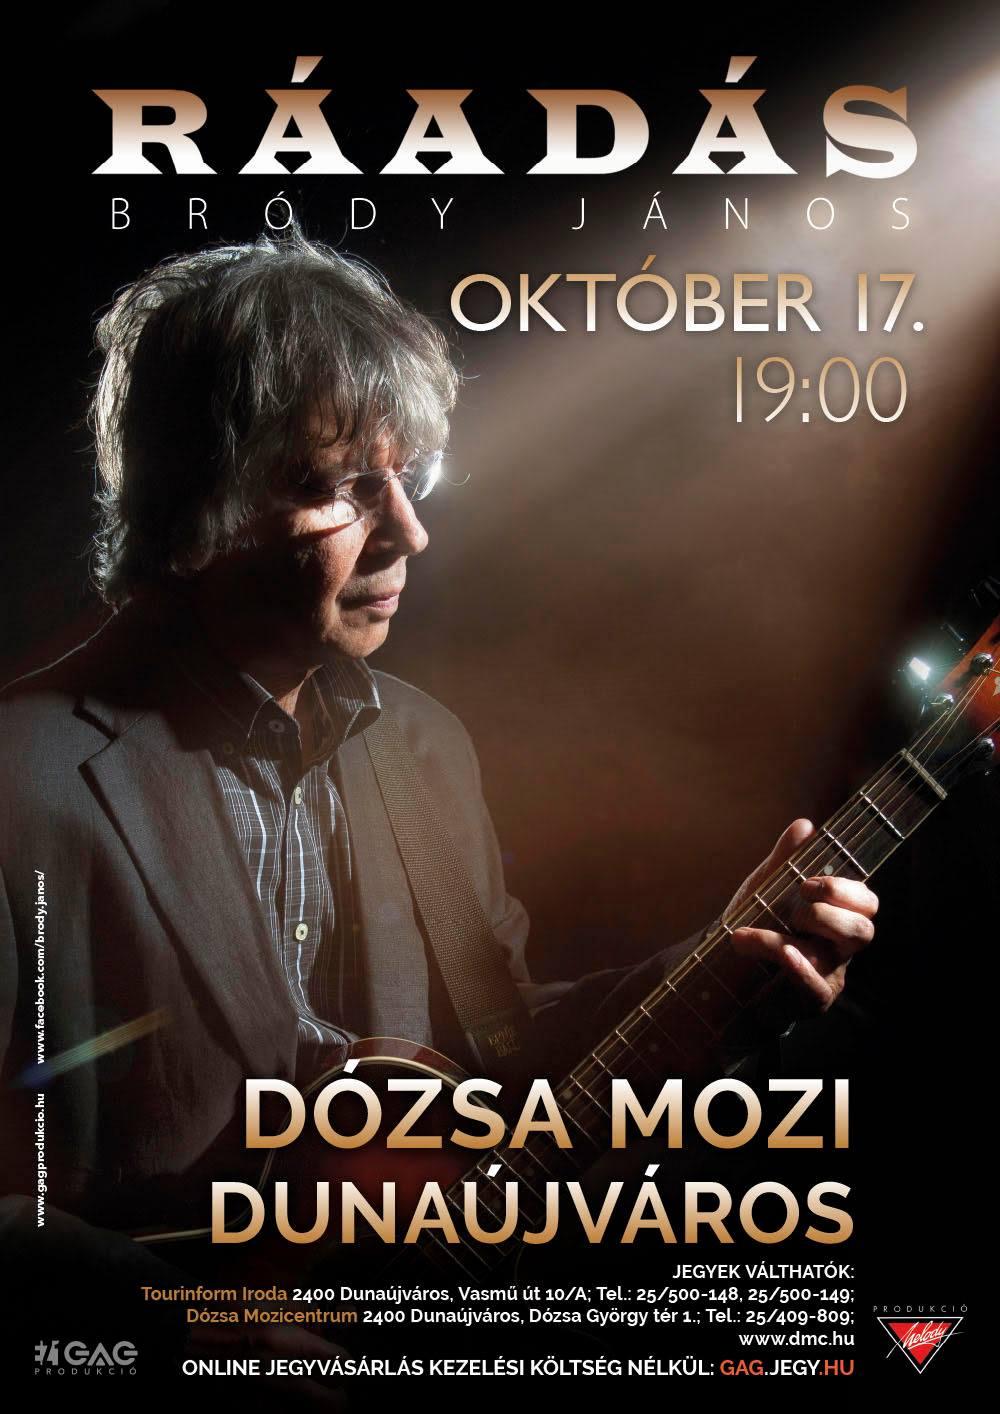 Bródy János koncertje ELMARAD!